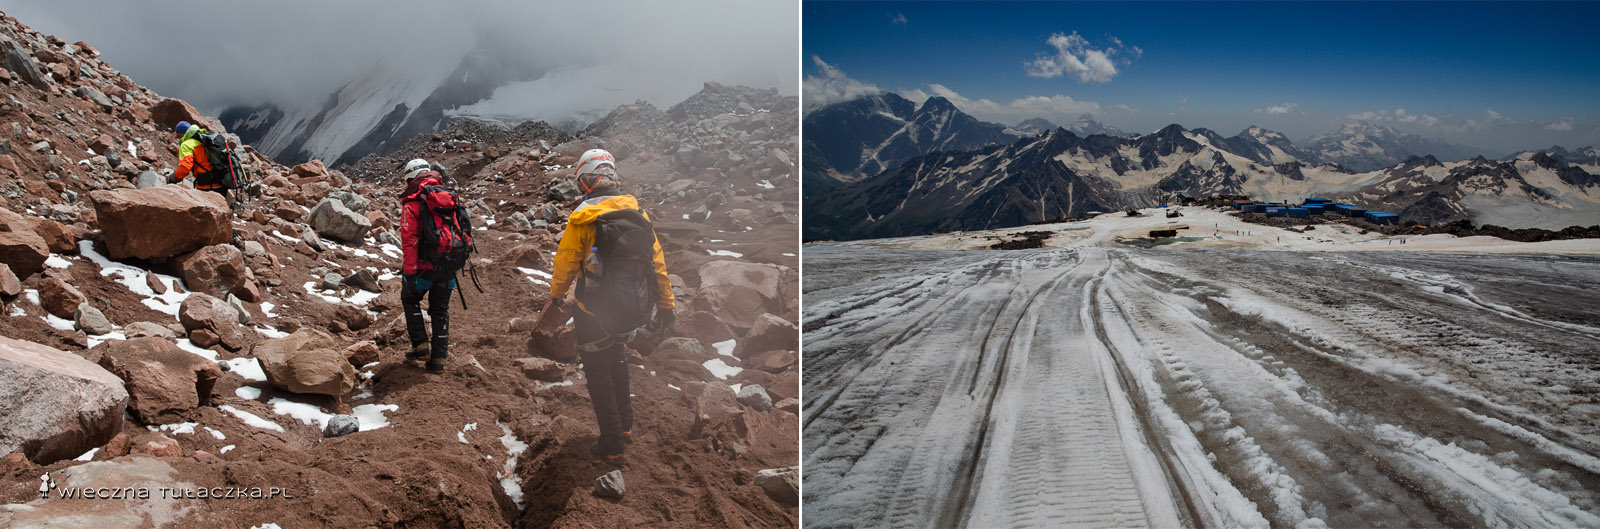 Wyprawa na Kazbek i Elbrus